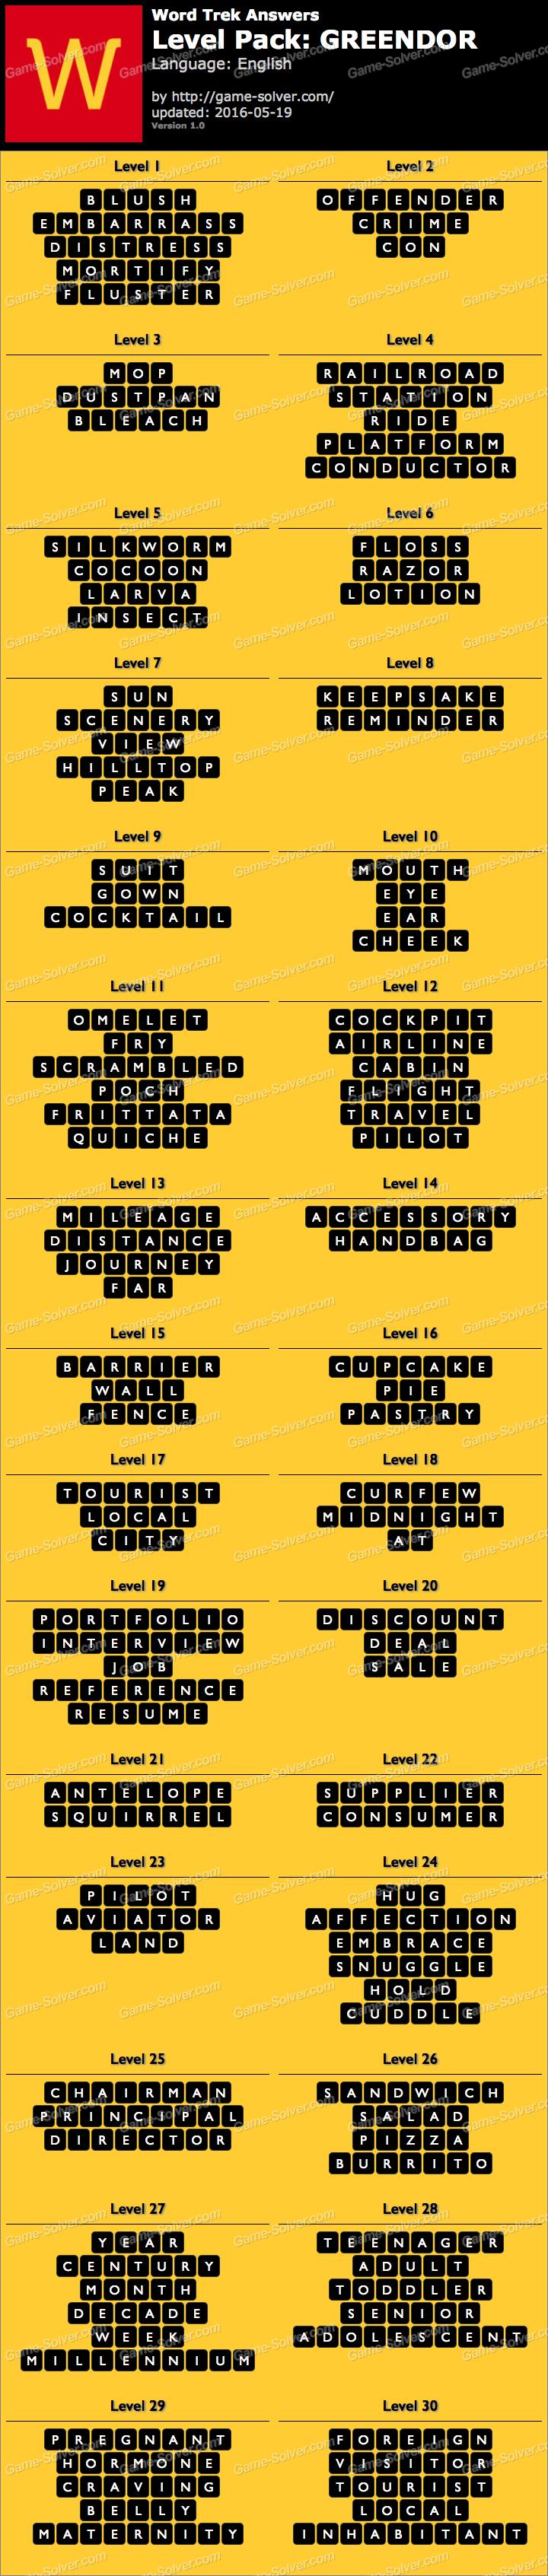 Word Trek Level Pack 74 GREENDOR Answers